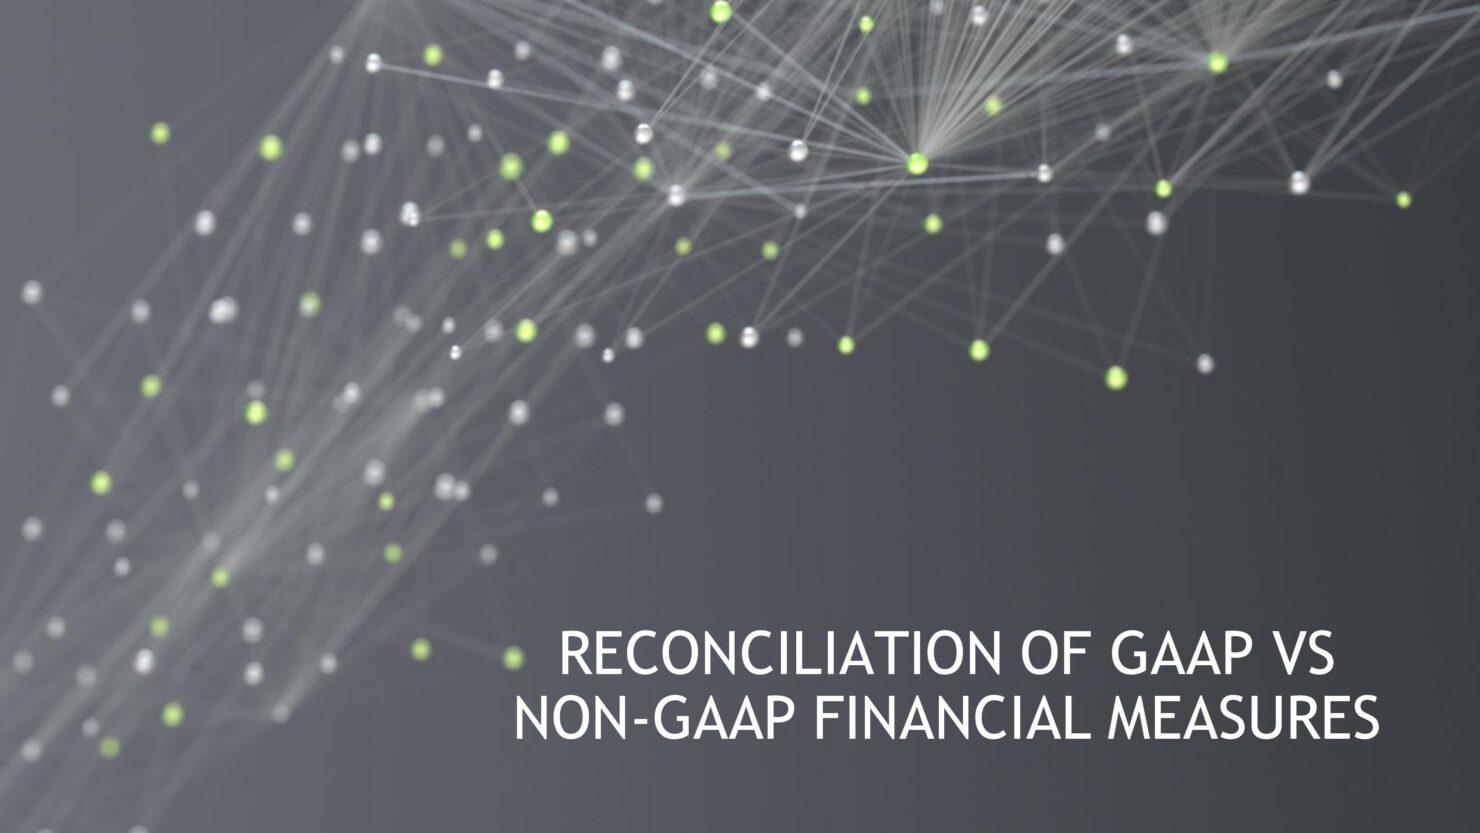 nvda-1qfy21-investor-presentation-5-21-20-final-page-039